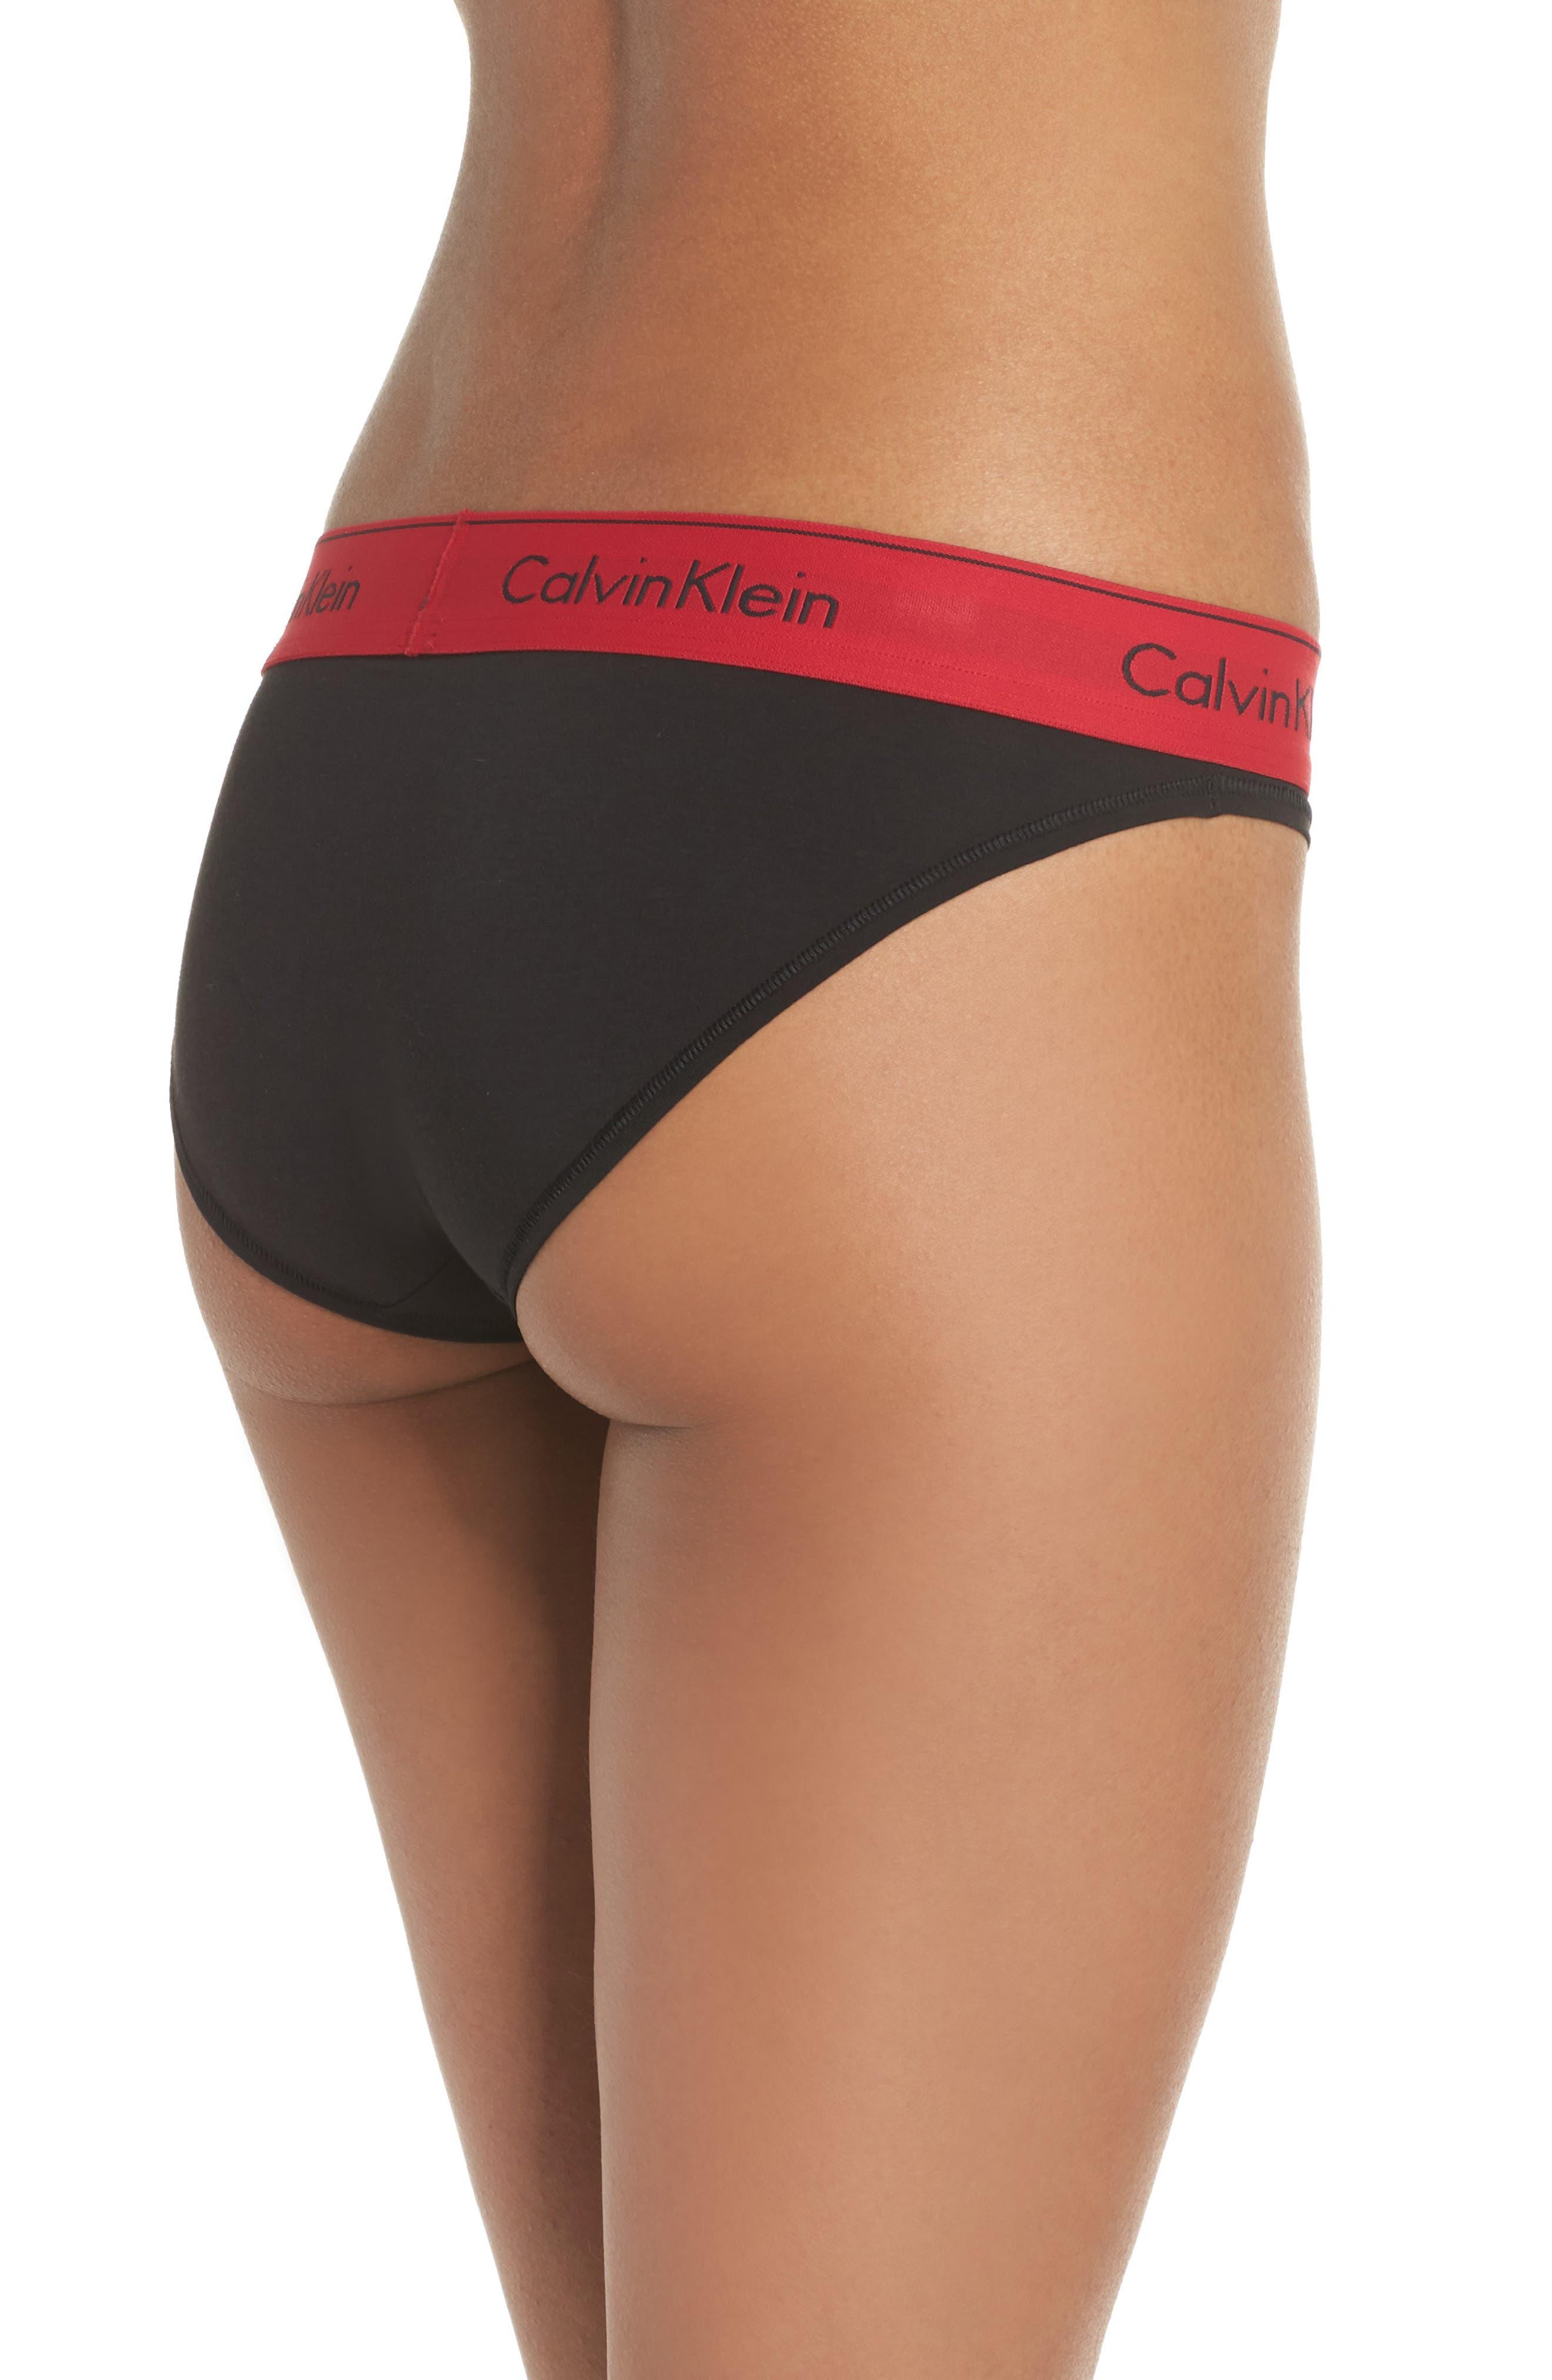 'Modern Cotton Collection' Cotton Blend Bikini,                             Alternate thumbnail 2, color,                             Black Empower